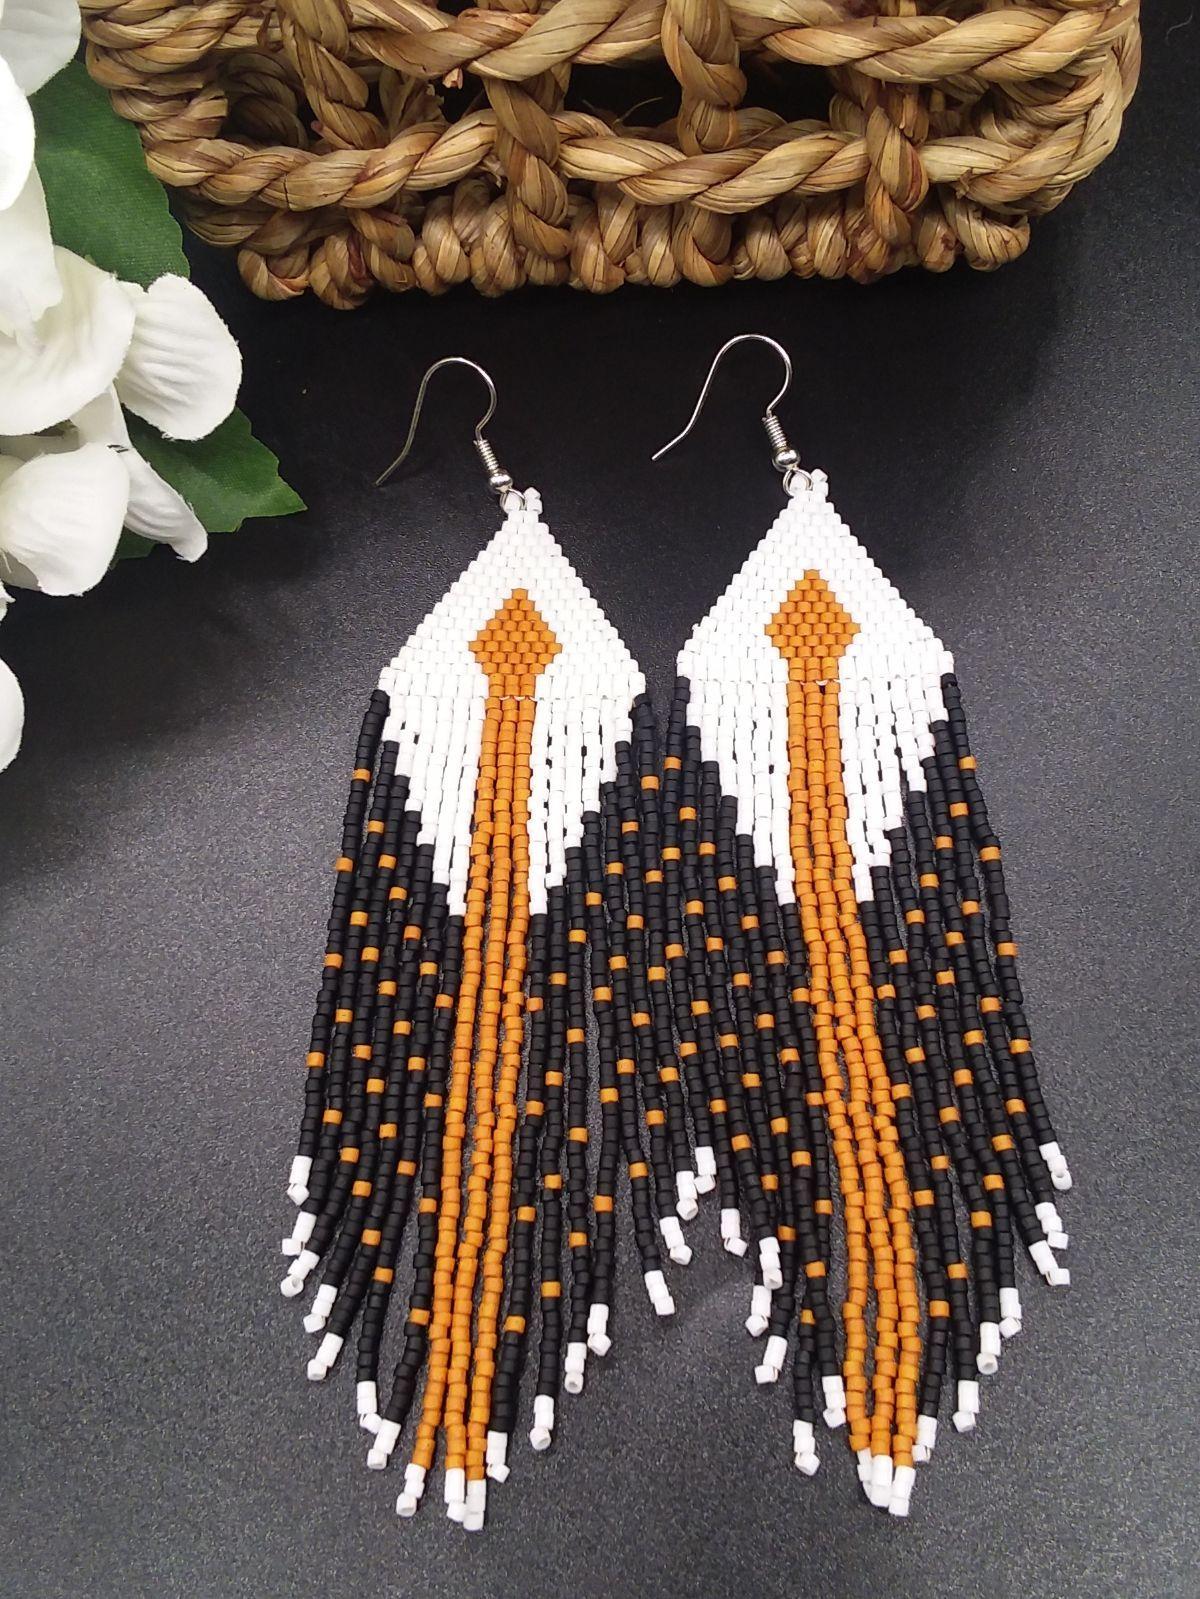 fringe diy jewelry tutorial rose gold wings Bead earring pattern brick stitch